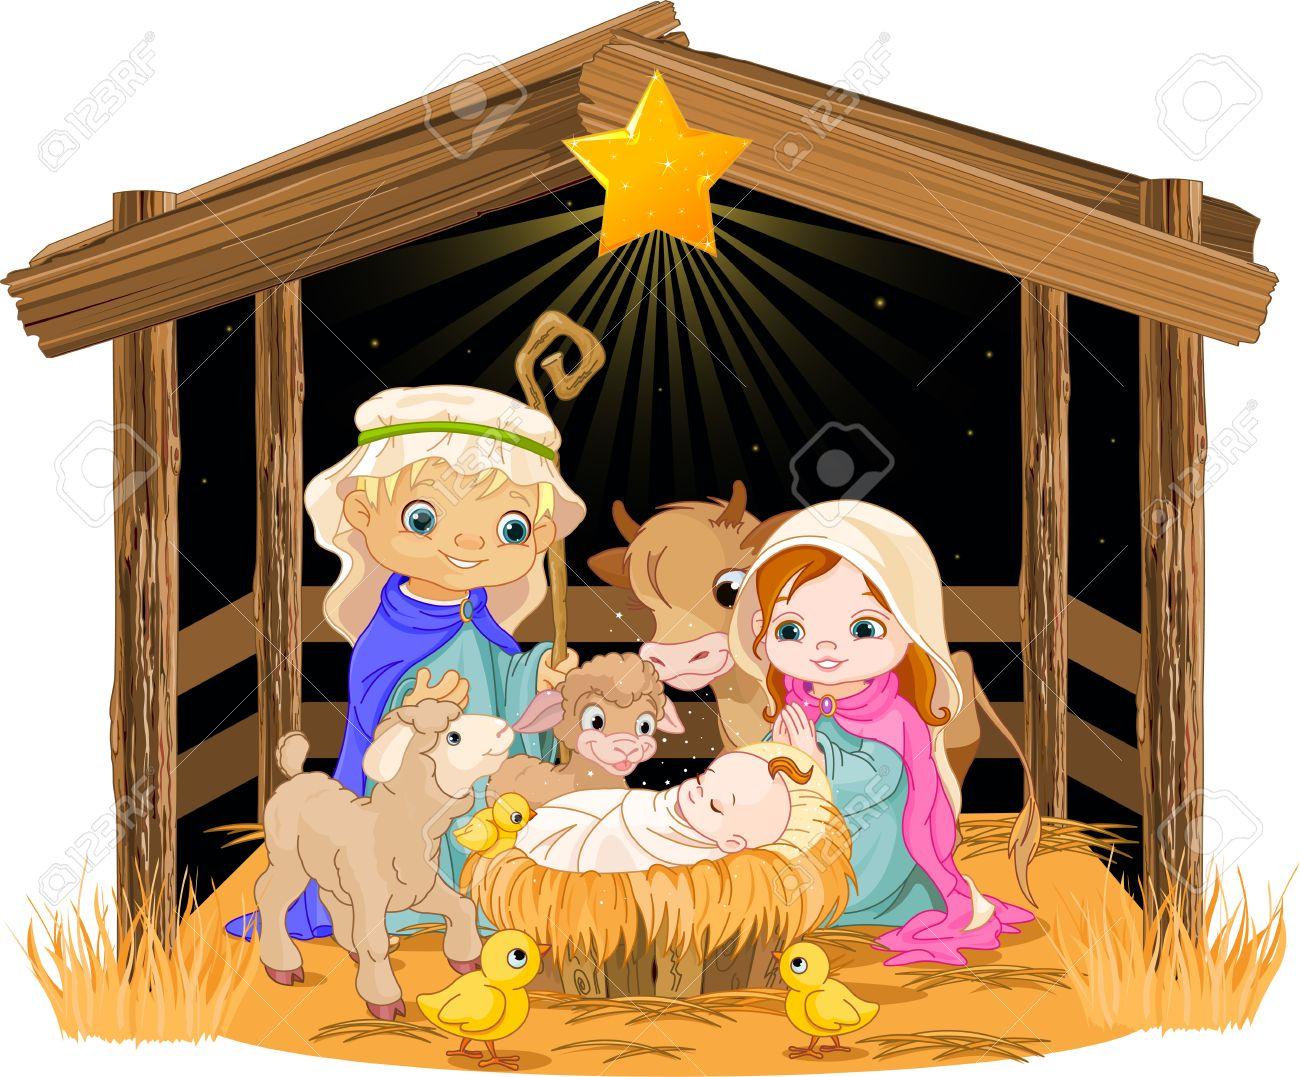 Christmas nativity scene with holy family Stock Vector - 24155176